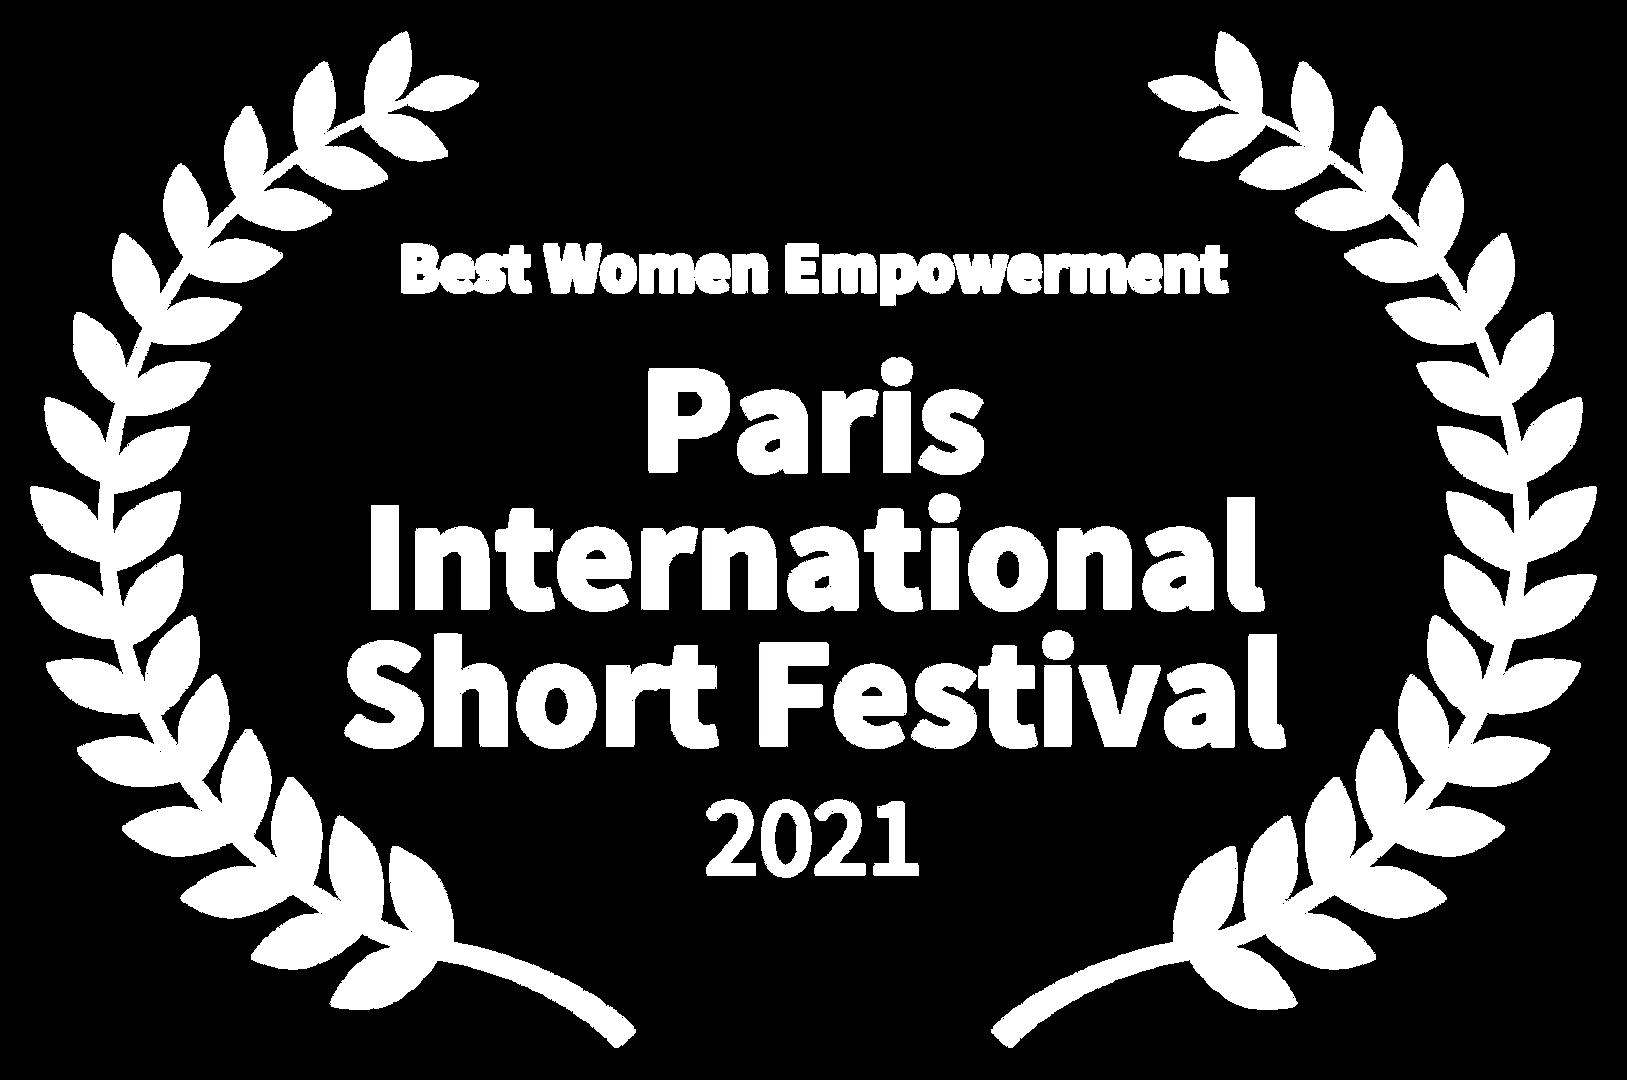 Best Women Empowerment - Paris Internati